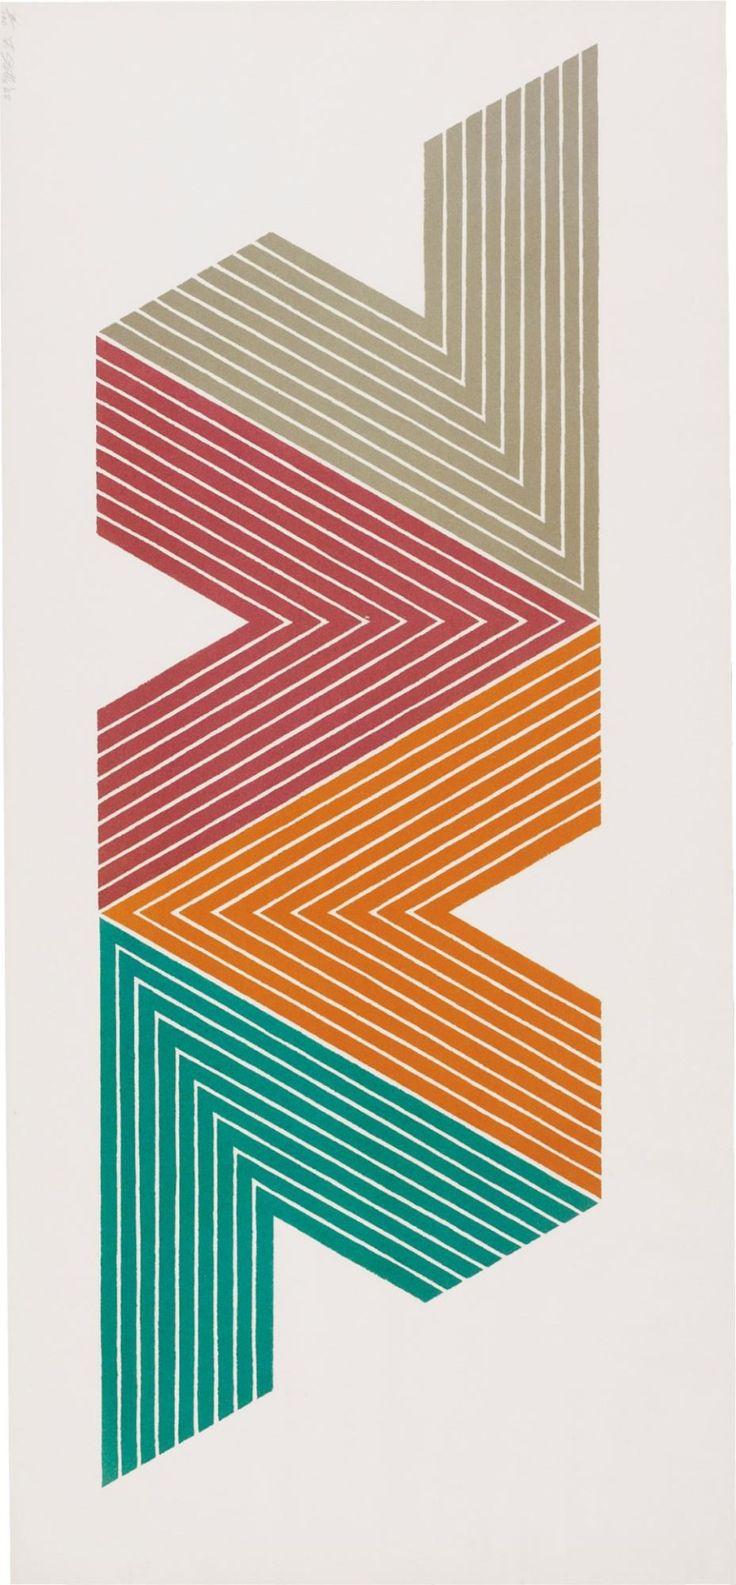 1000 images about art frank stella on pinterest for Minimal art frank stella